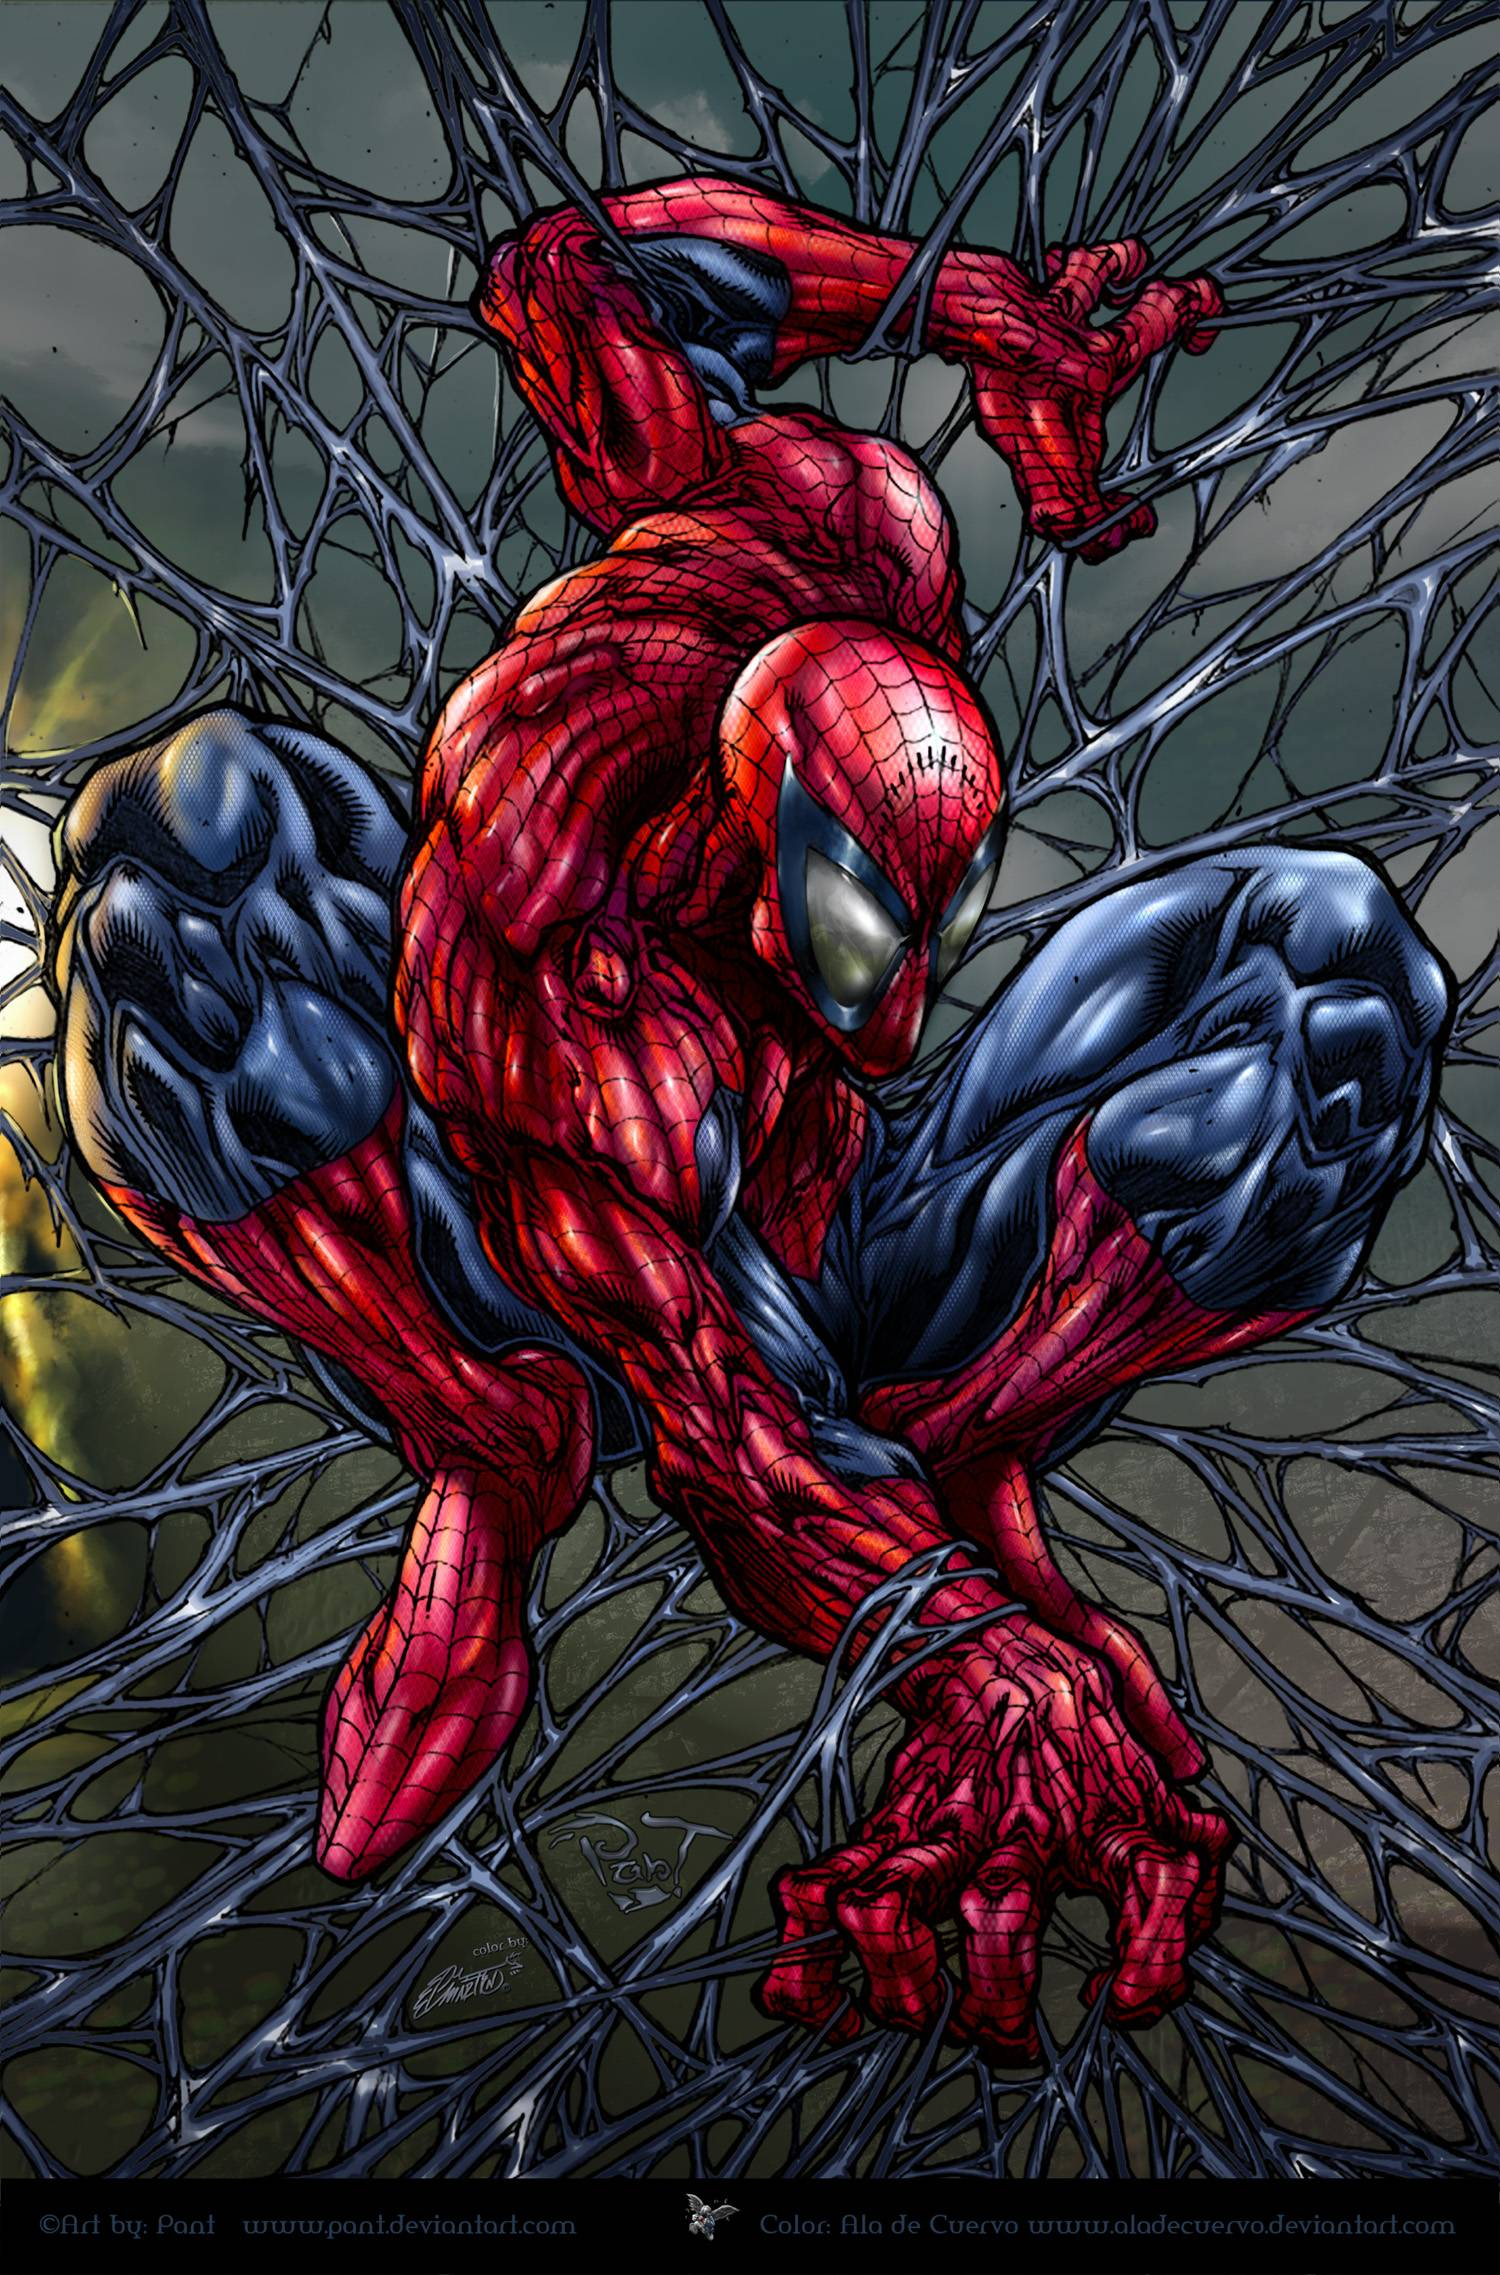 Spider-Man Cartoon Wallpapers - Wallpaper Cave